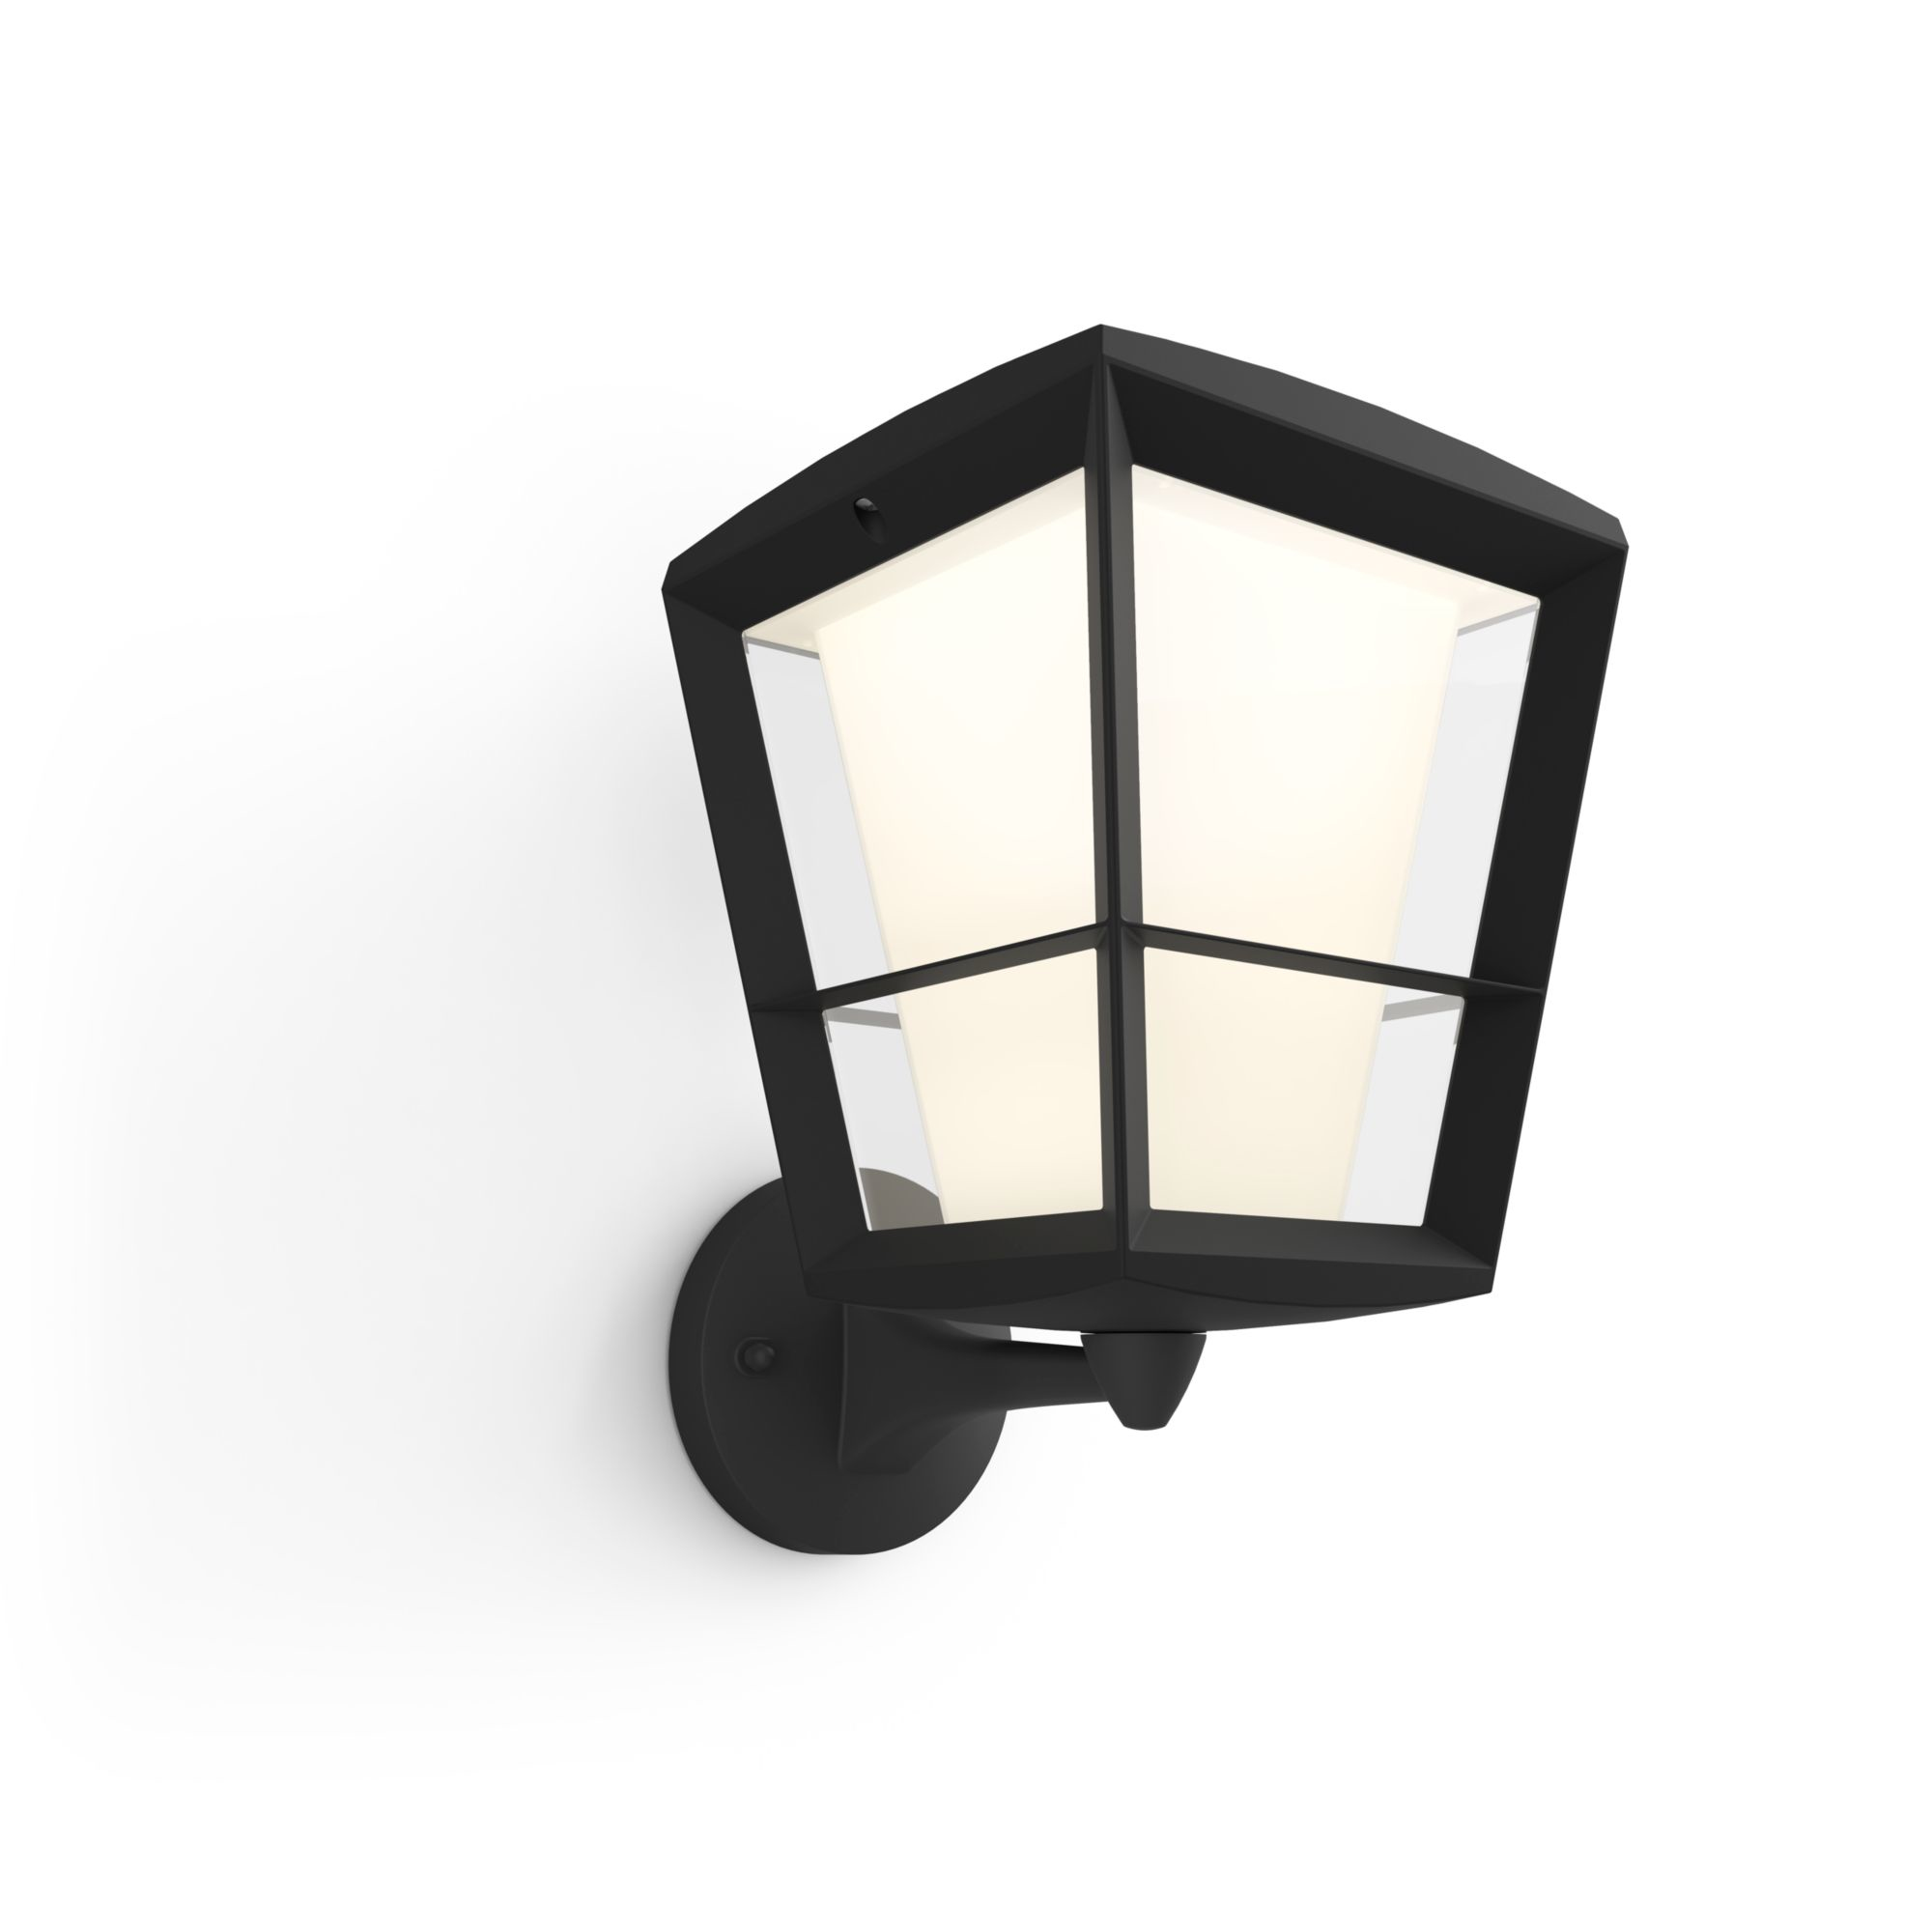 Philips Hue Econic LED Wandleuchte stehend schwarz